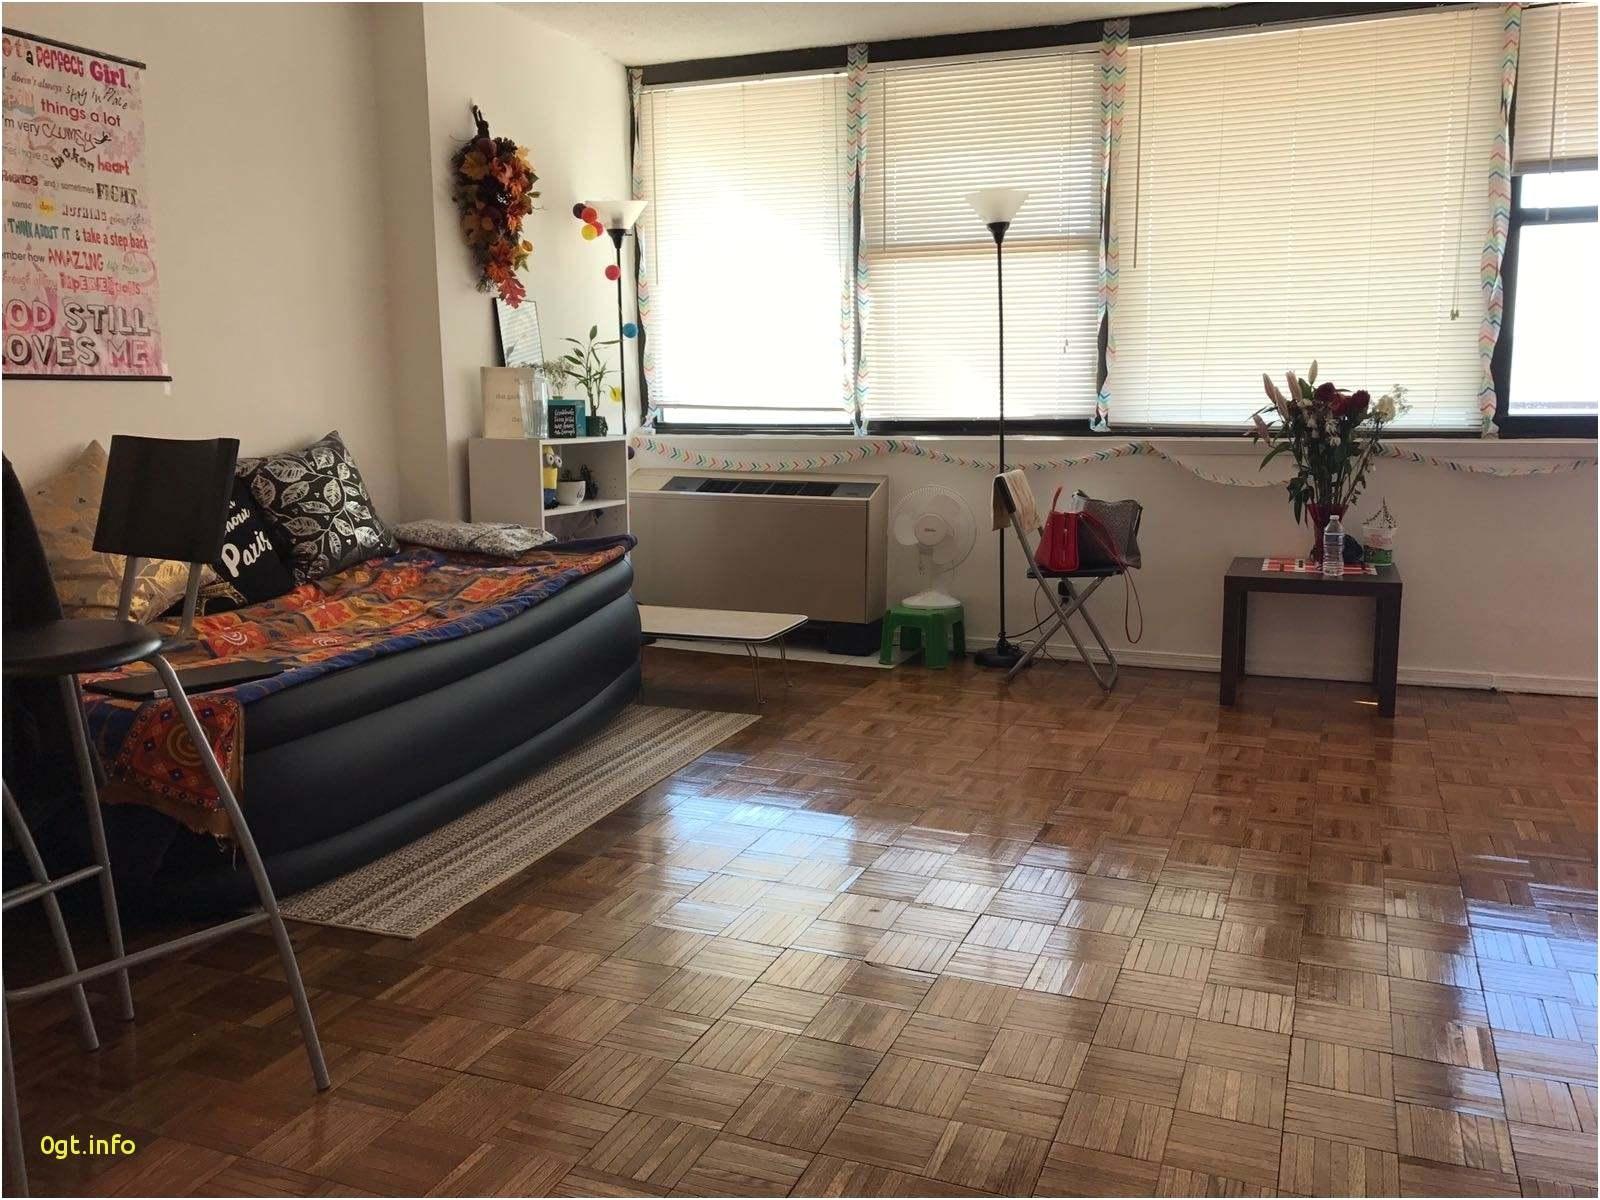 25 one bedroom apartments tampa fl primary 35 luxury e bedroom apartments tampa fl bedroom design